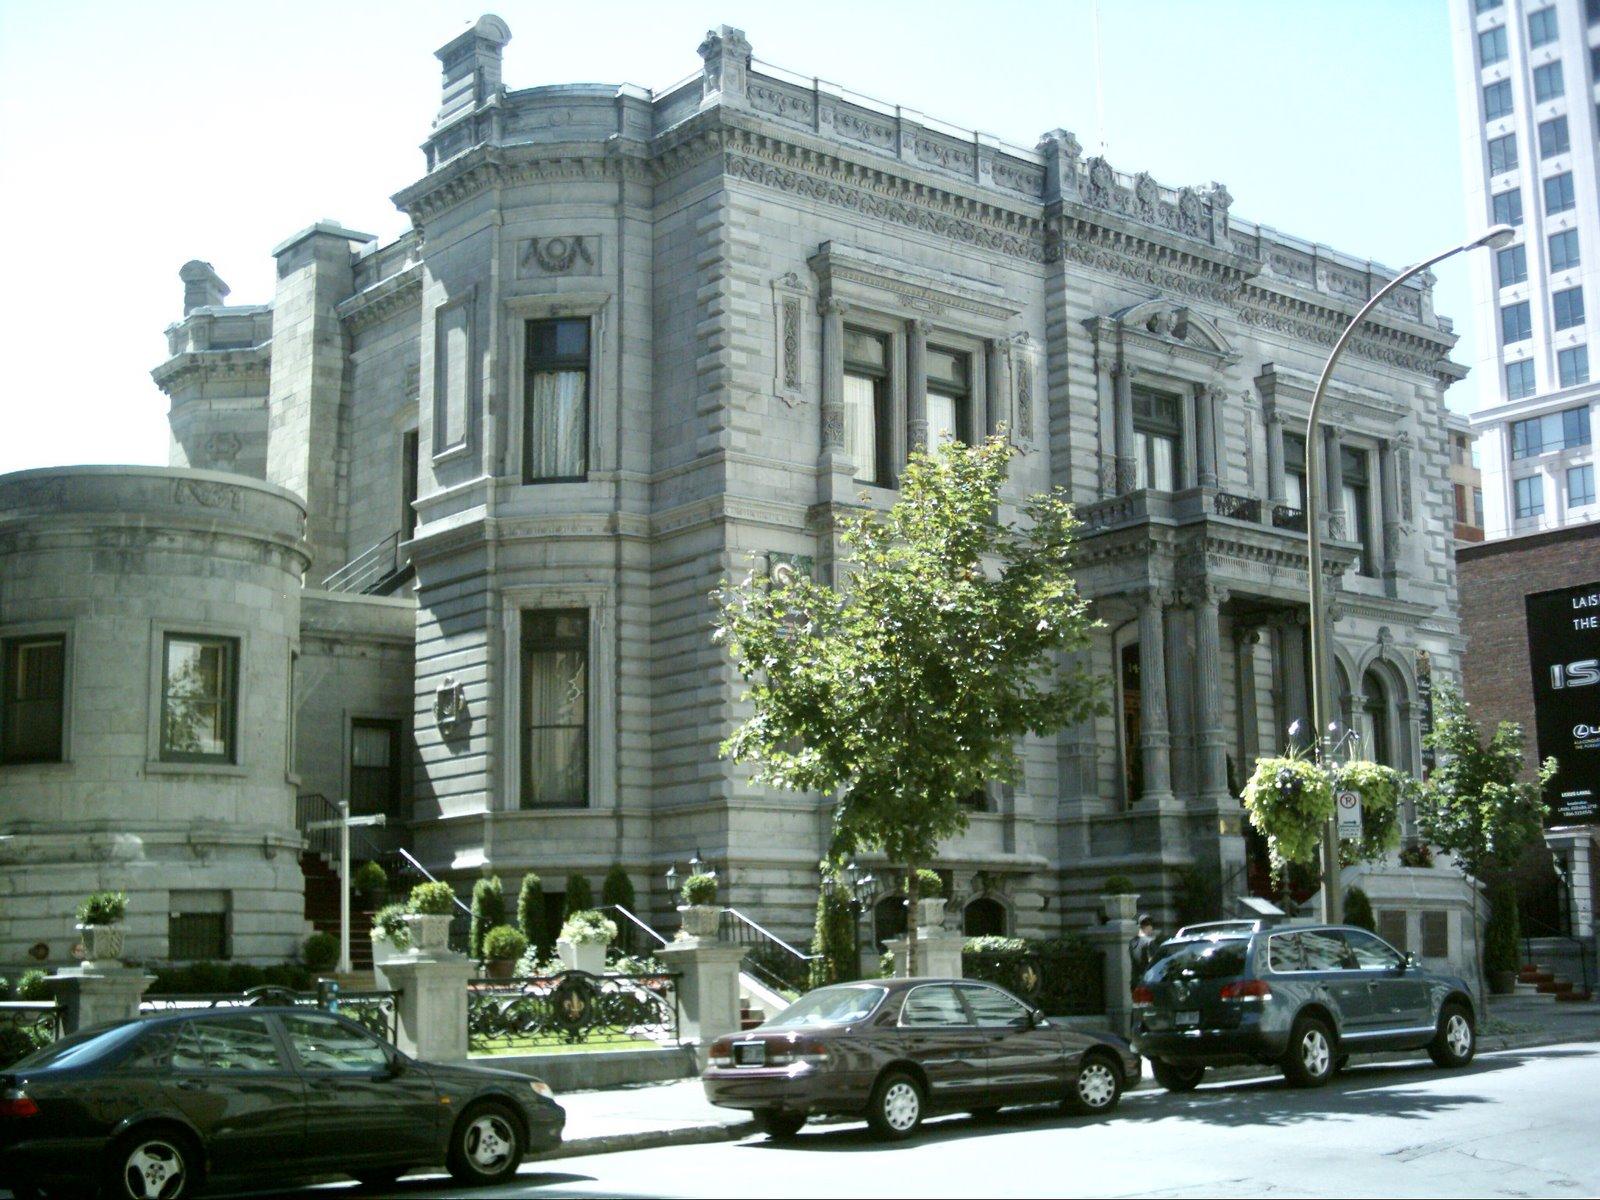 File:Maison Stephen.JPG - Wikimedia Commons